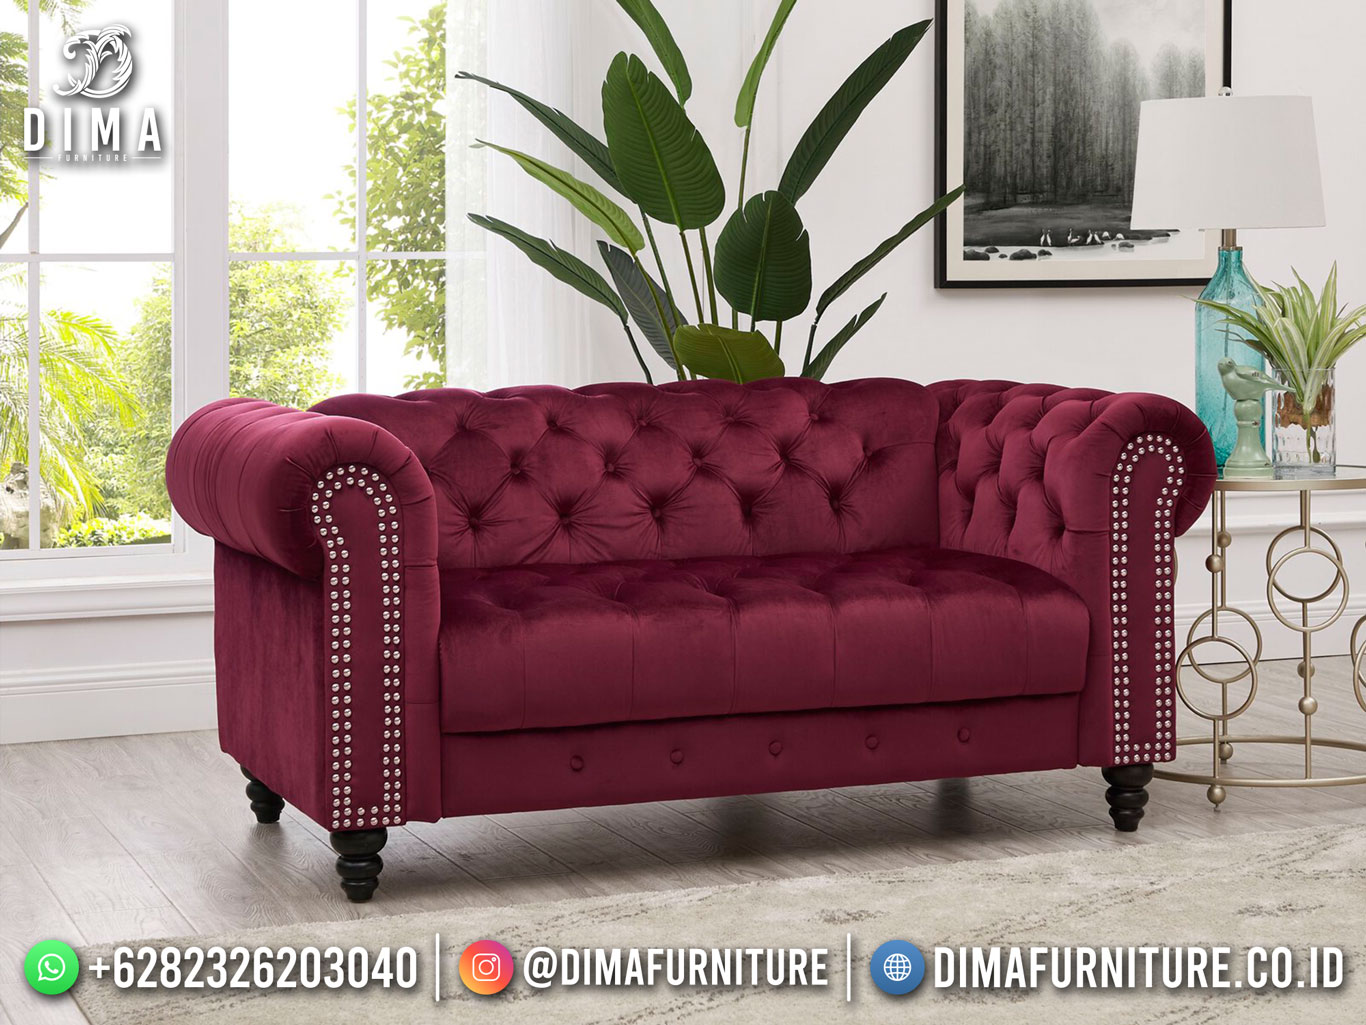 Palazzo 2 Seater Sofa Minimalis Beauty Magenta Good Quality TTJ-1794